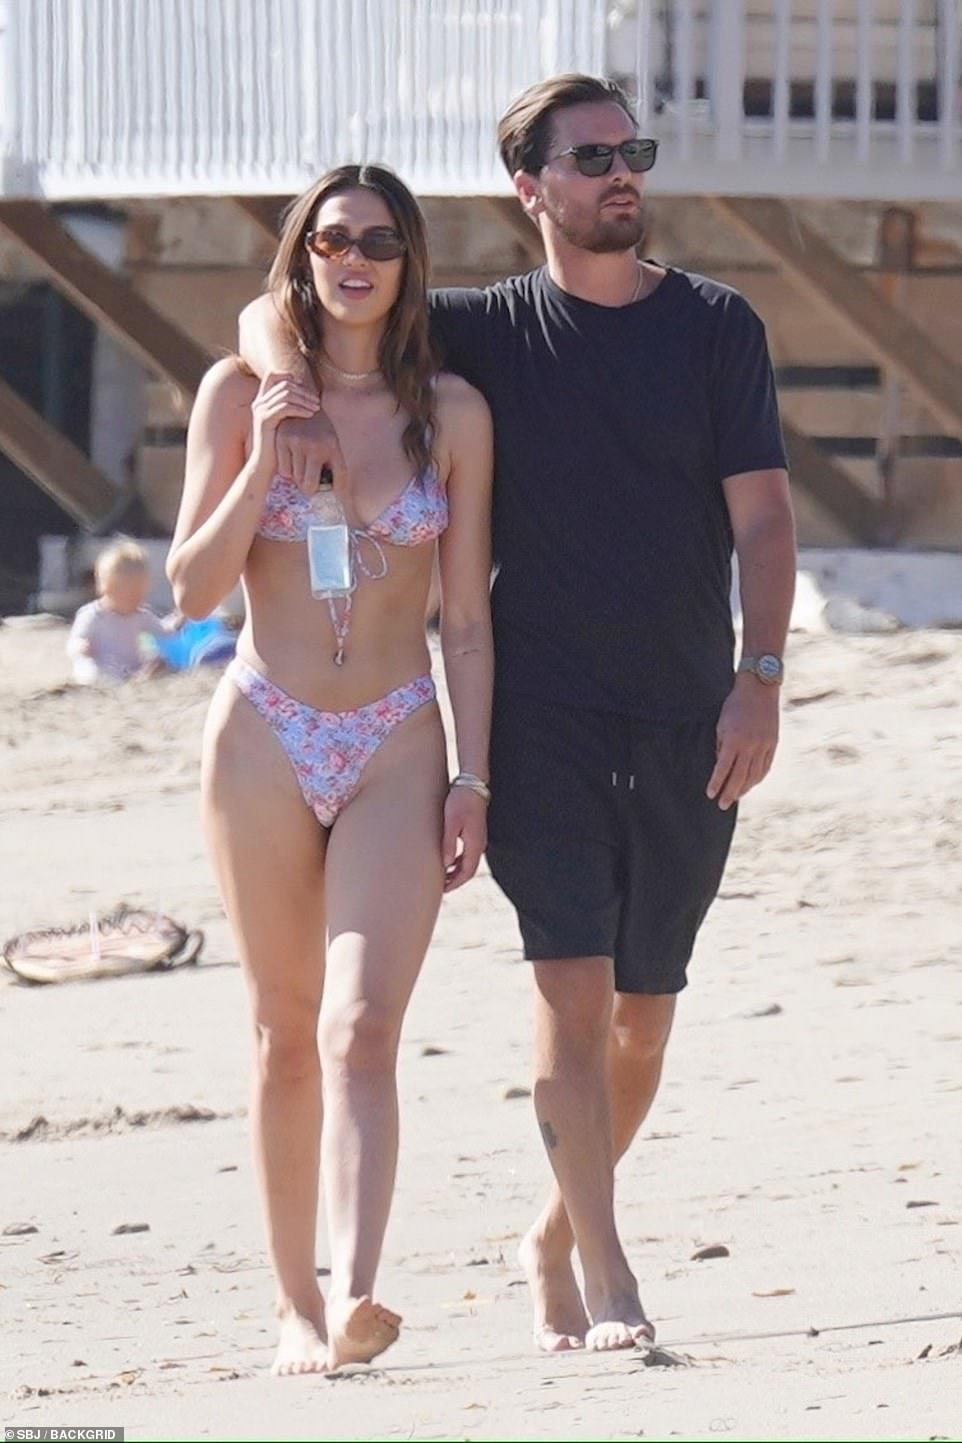 Scott Disick, 37, puts his arm around a bikini-clad Amelia Hamlin, 19, in Malibu